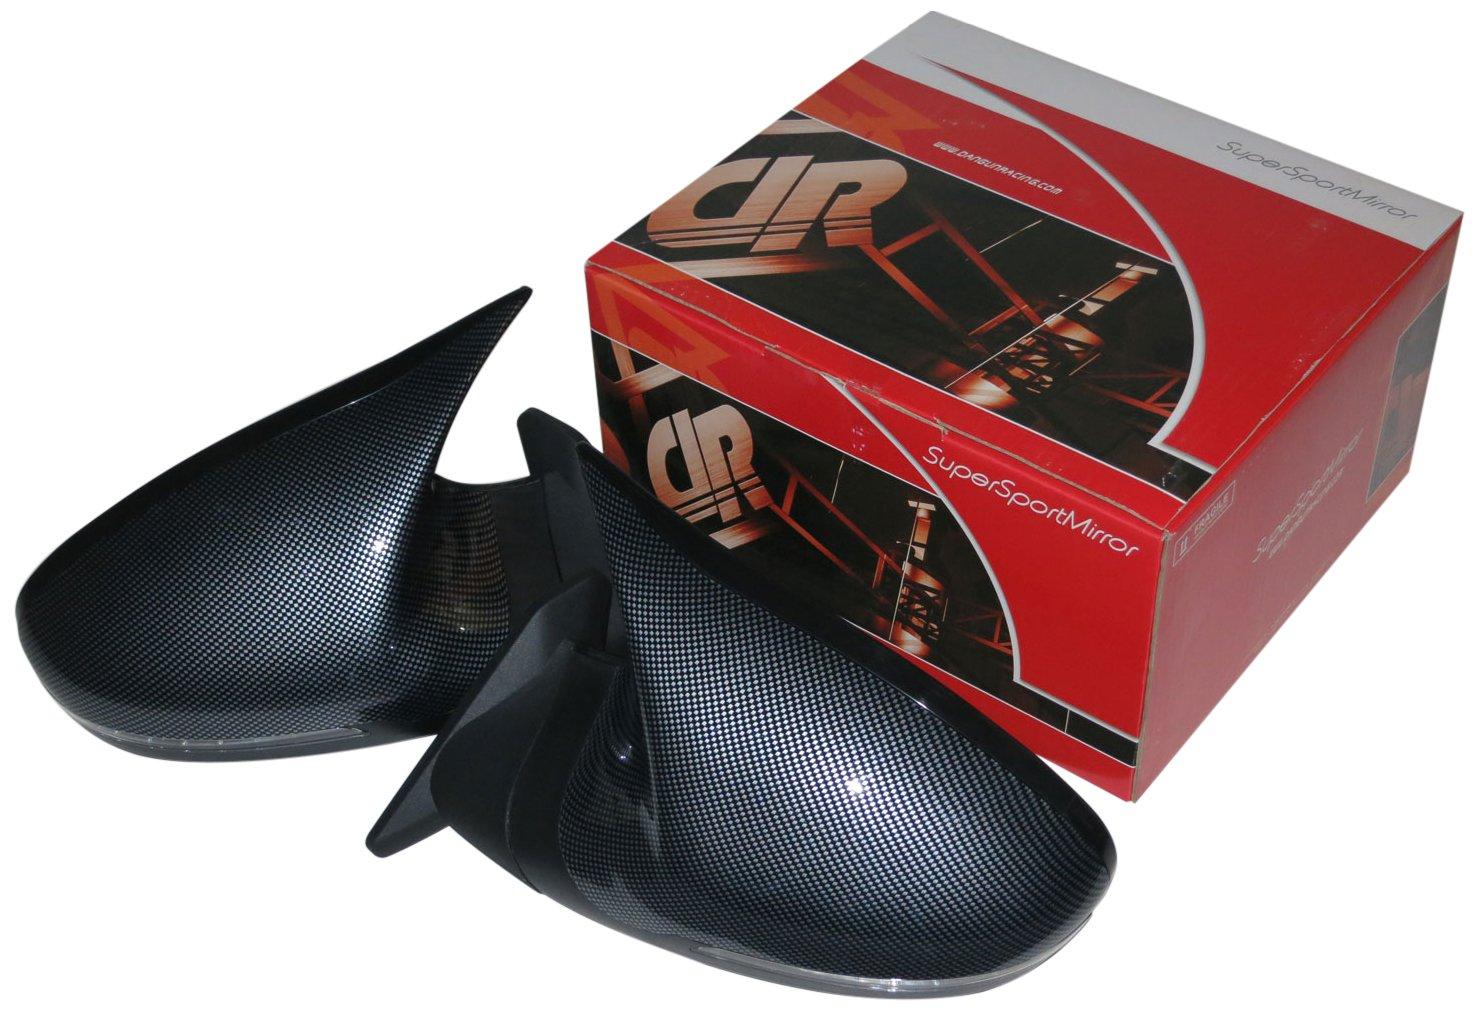 GTSミラー LED カーボンルック ミラー面電動調整 右ハンドル フォルクスワーゲン ルポ 6X系 [2001~2006] SBMGTSCBALHR-0211 B071KF3VVZ フォルクスワーゲン ルポ 6X系 [2001~2006]|カーボンルック カーボンルック フォルクスワーゲン ルポ 6X系 [2001~2006]